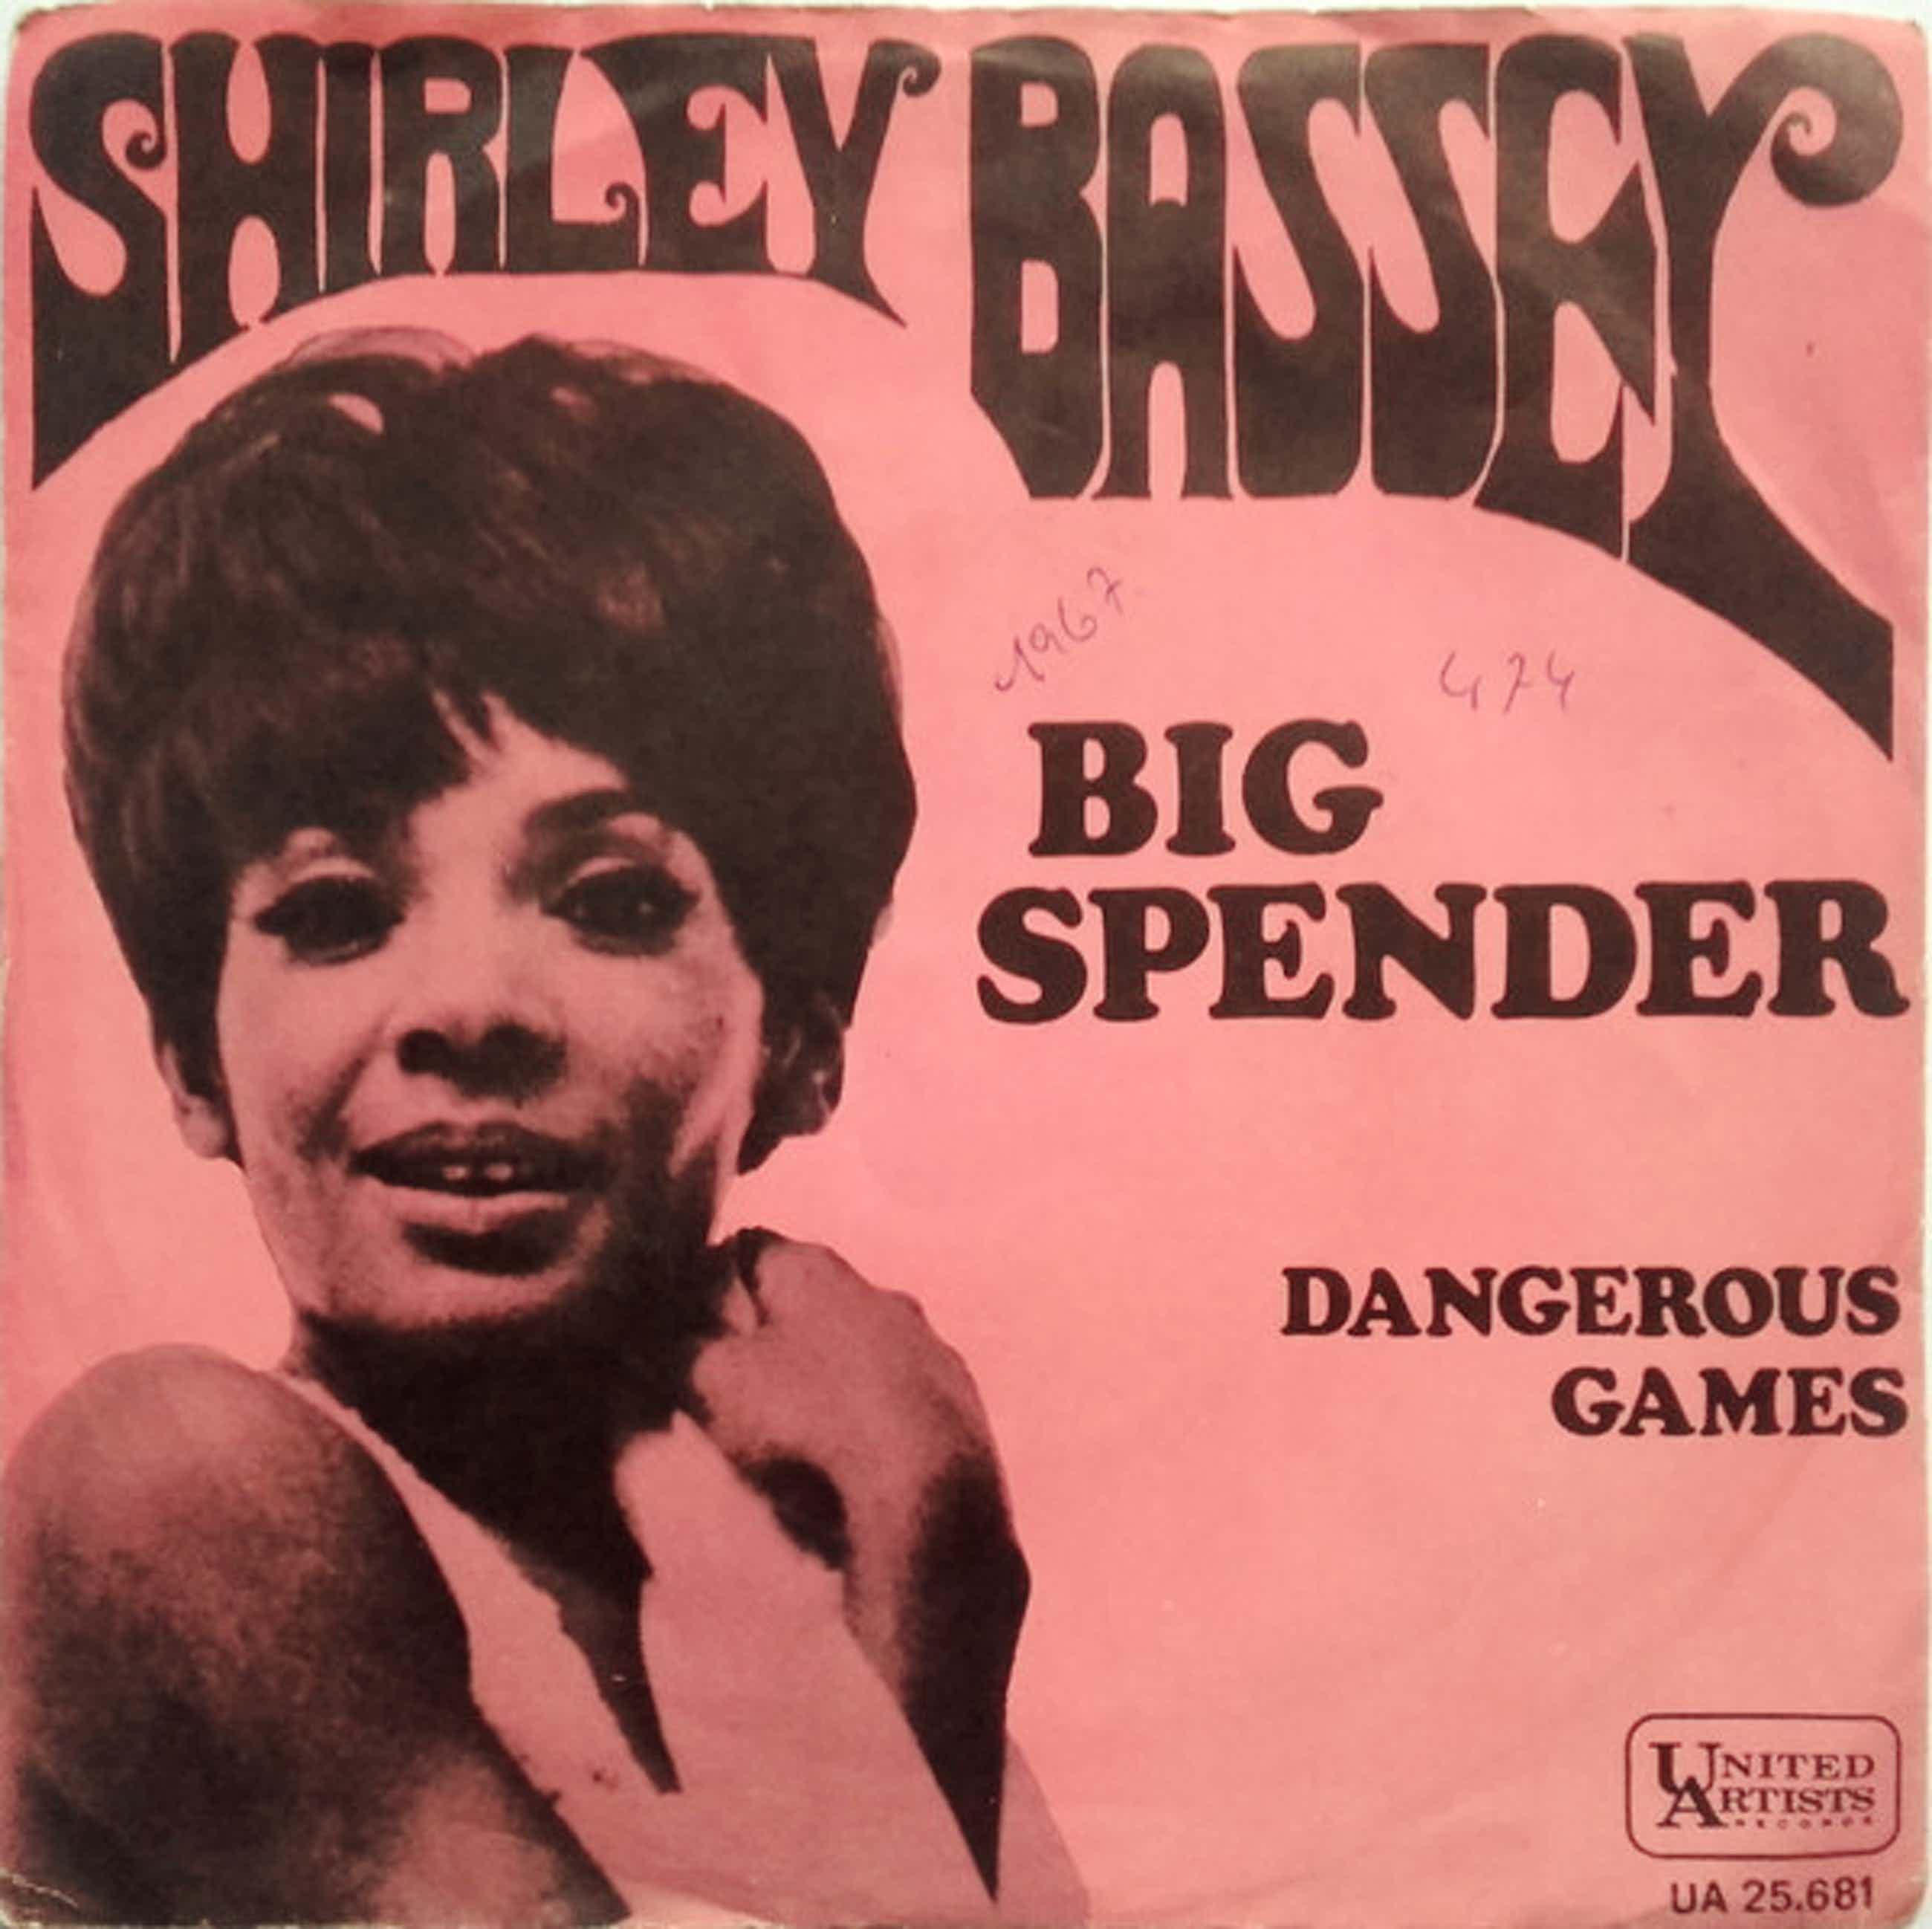 Various artists - lot van 2 singles: Shirley Bassey, Dionne Warwick kopen? Bied vanaf 10!